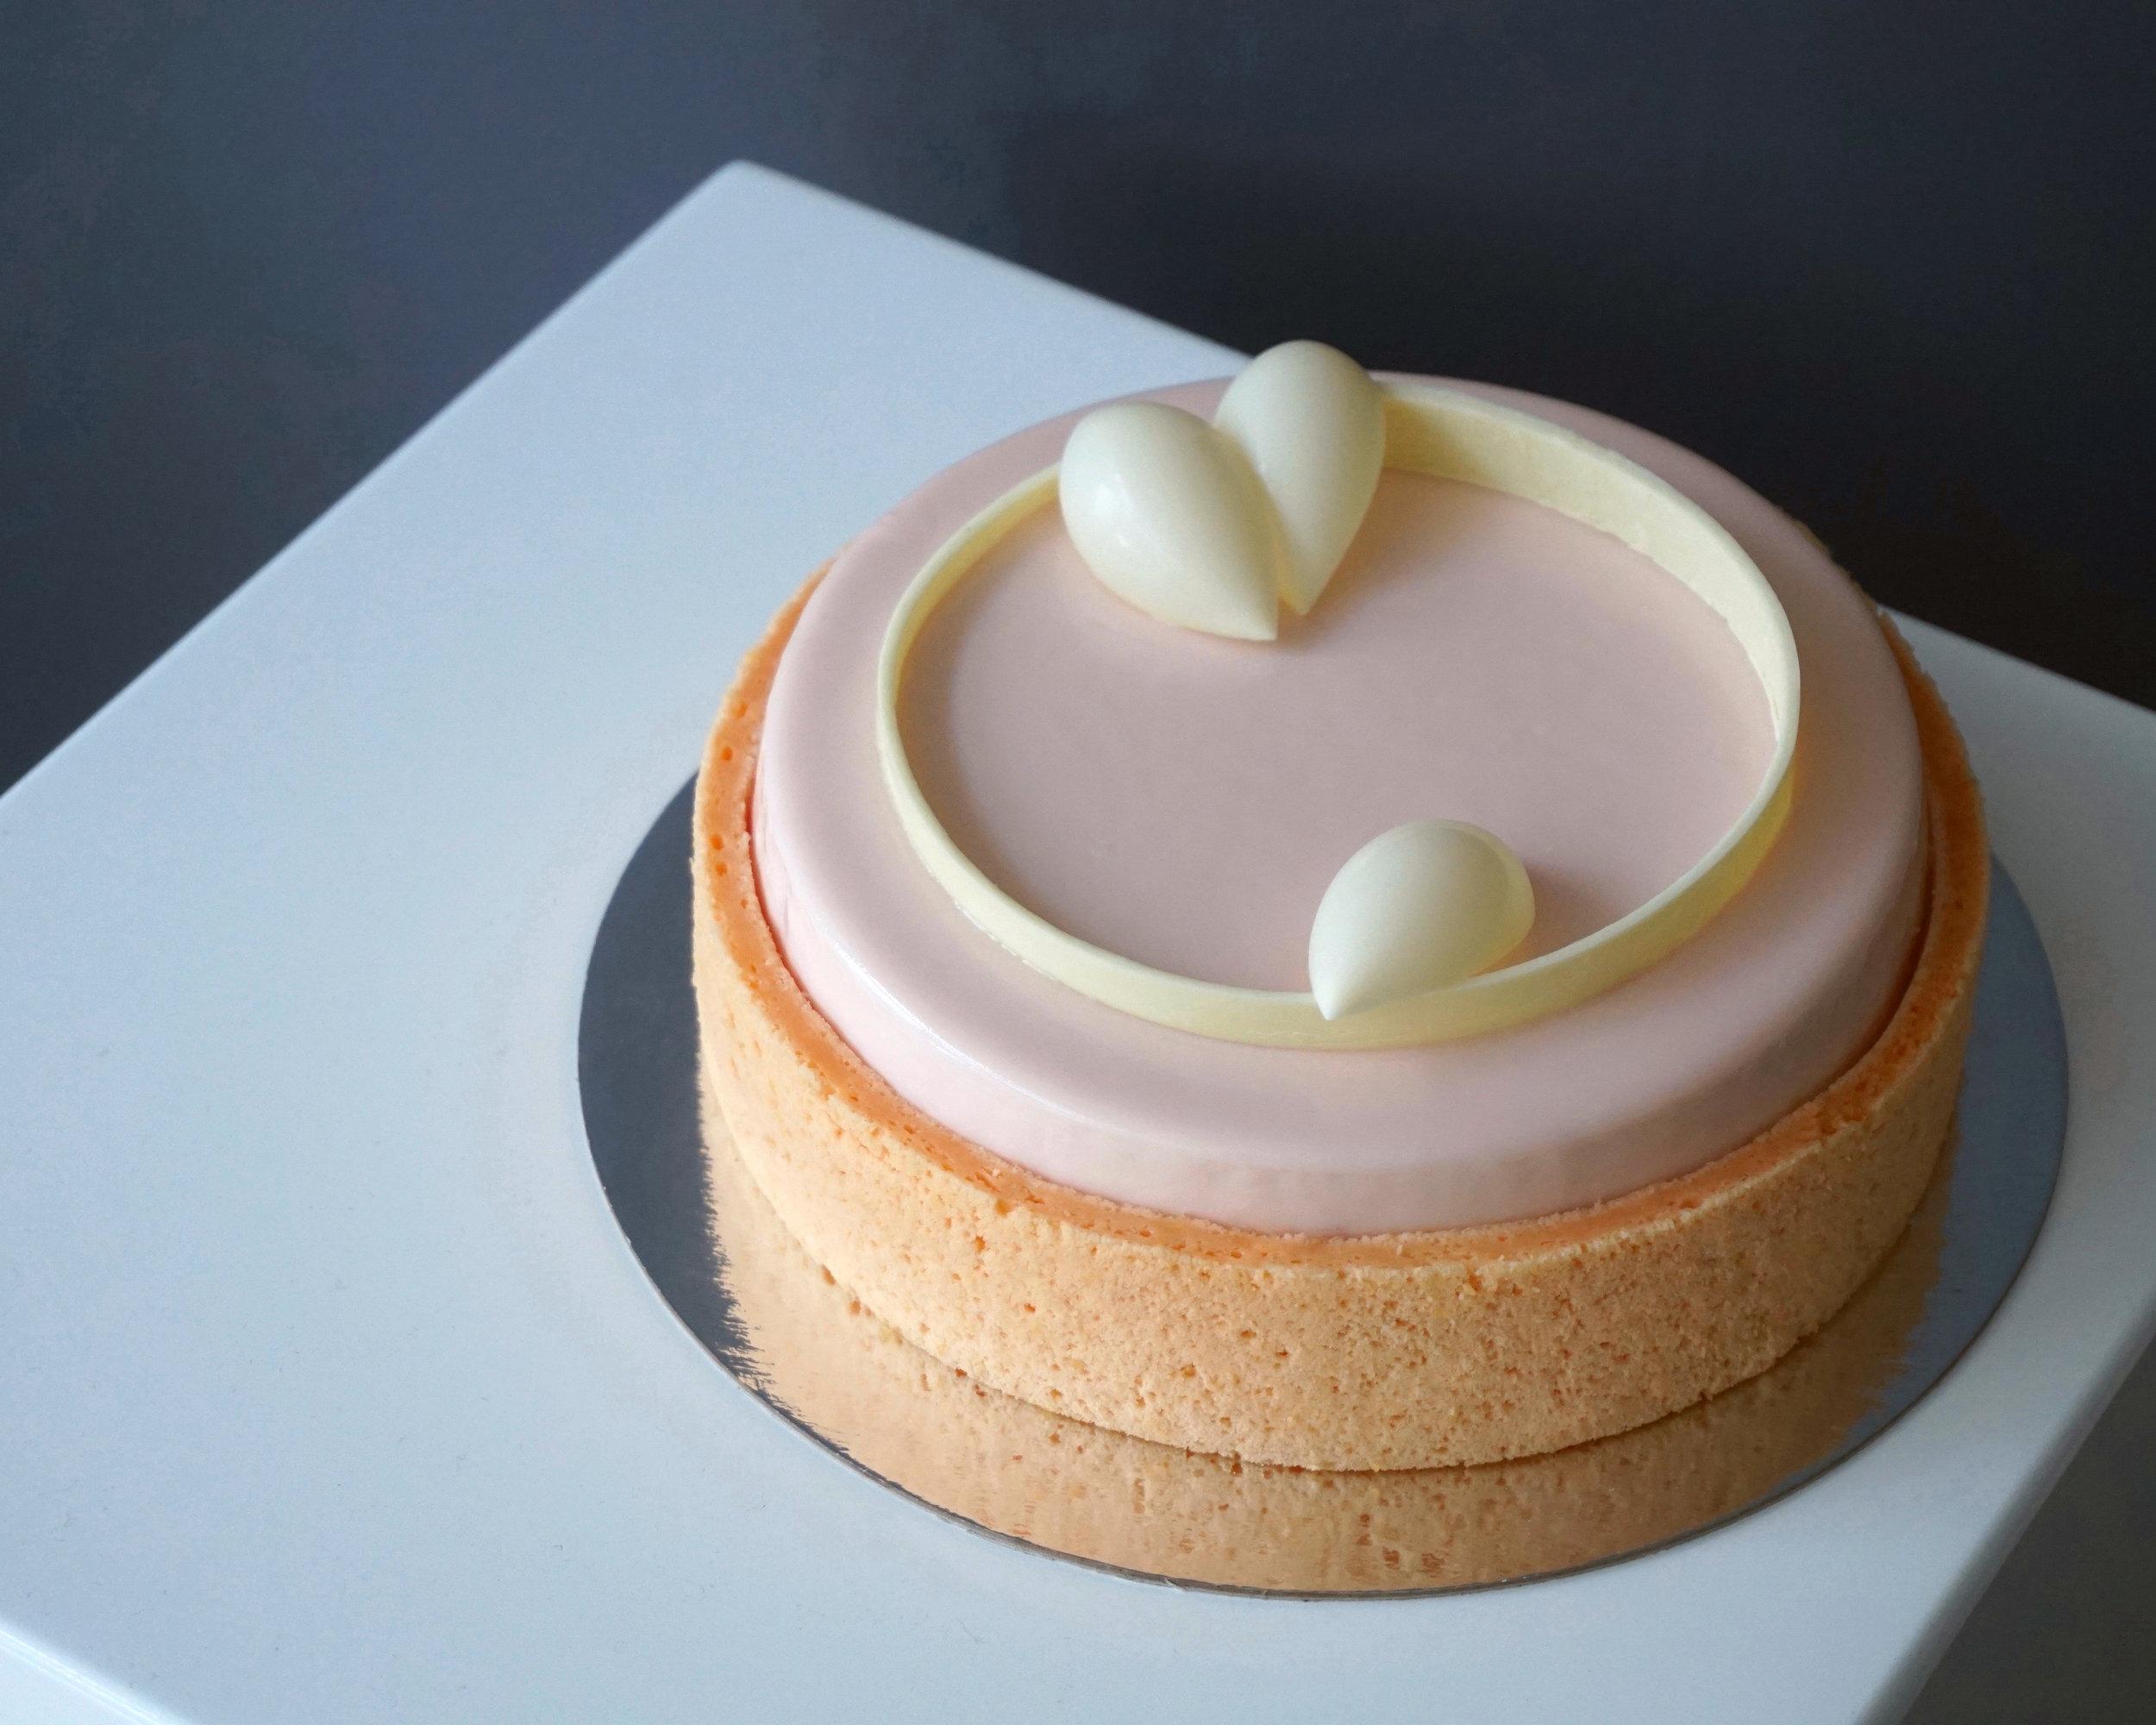 Peach sake entremet made by Gusta Cooking Studio